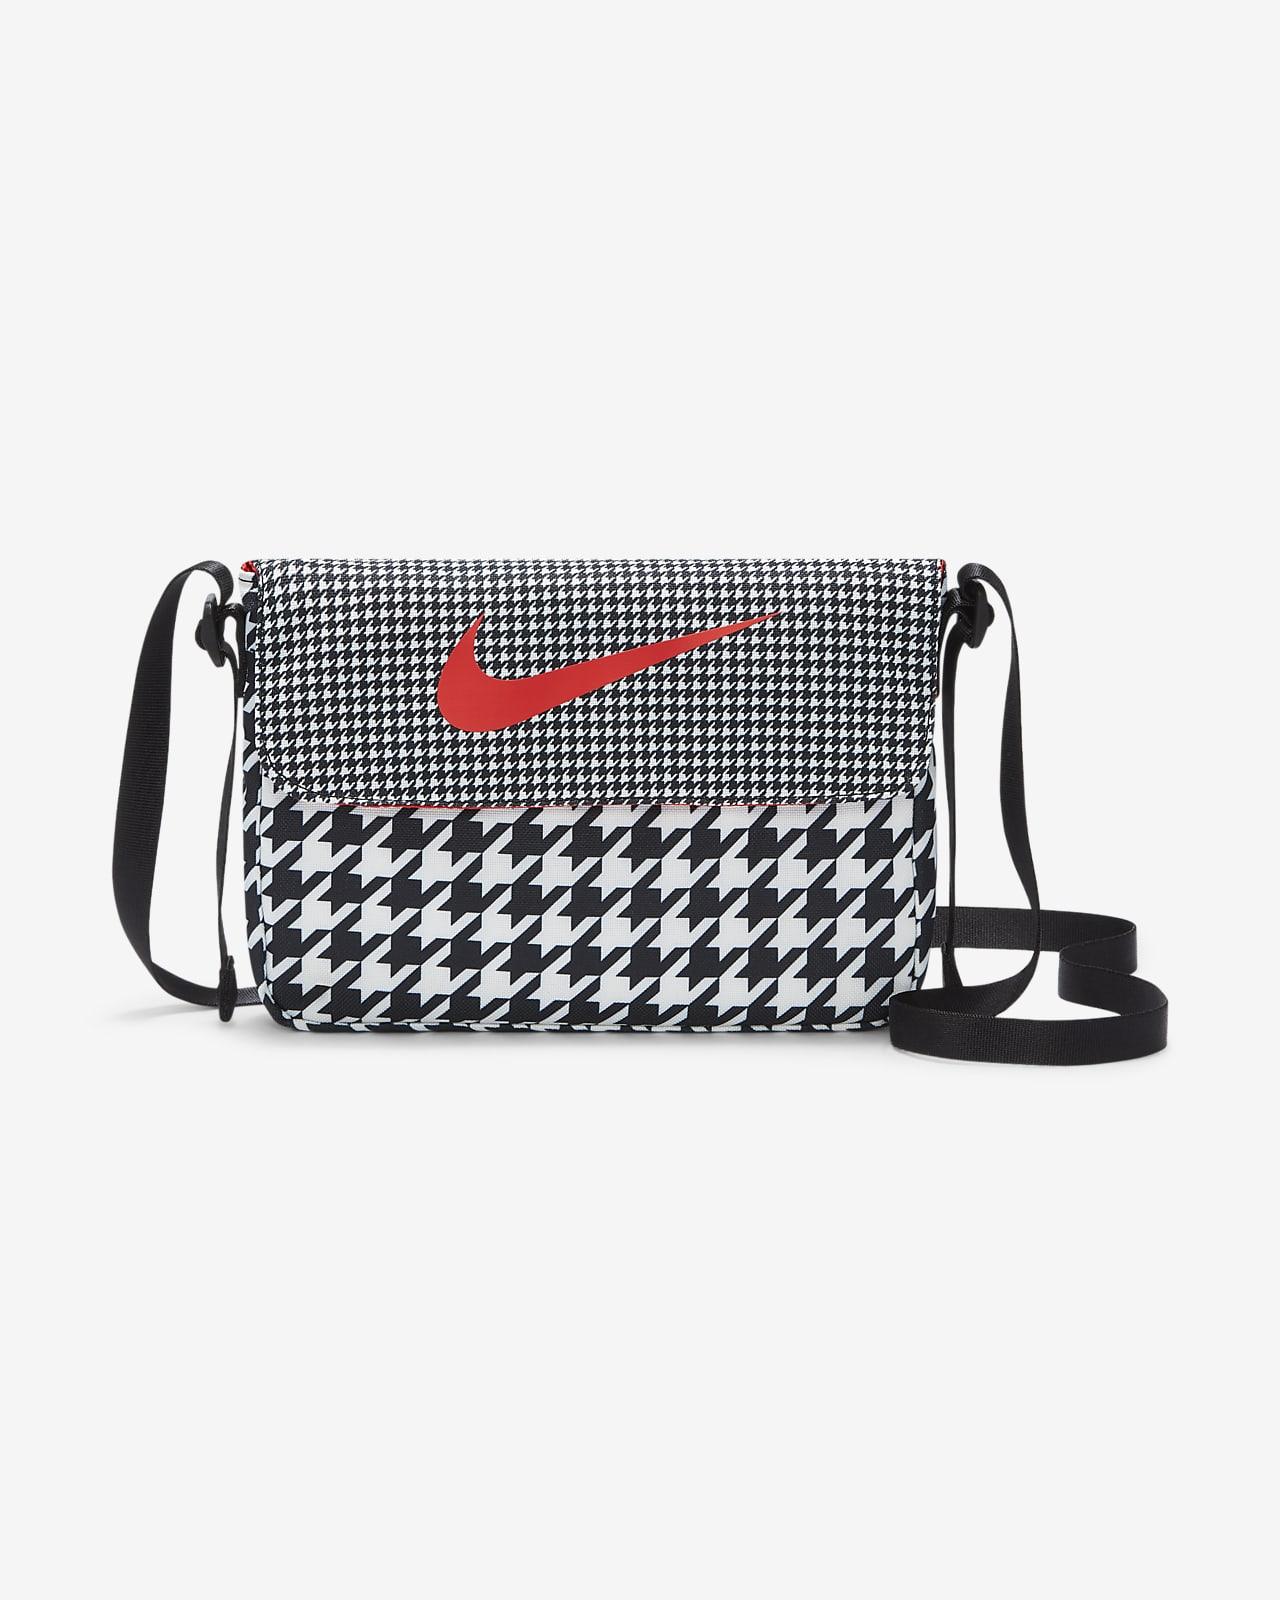 Nike Sportswear Futura 365 Women's Cross-Body Bag